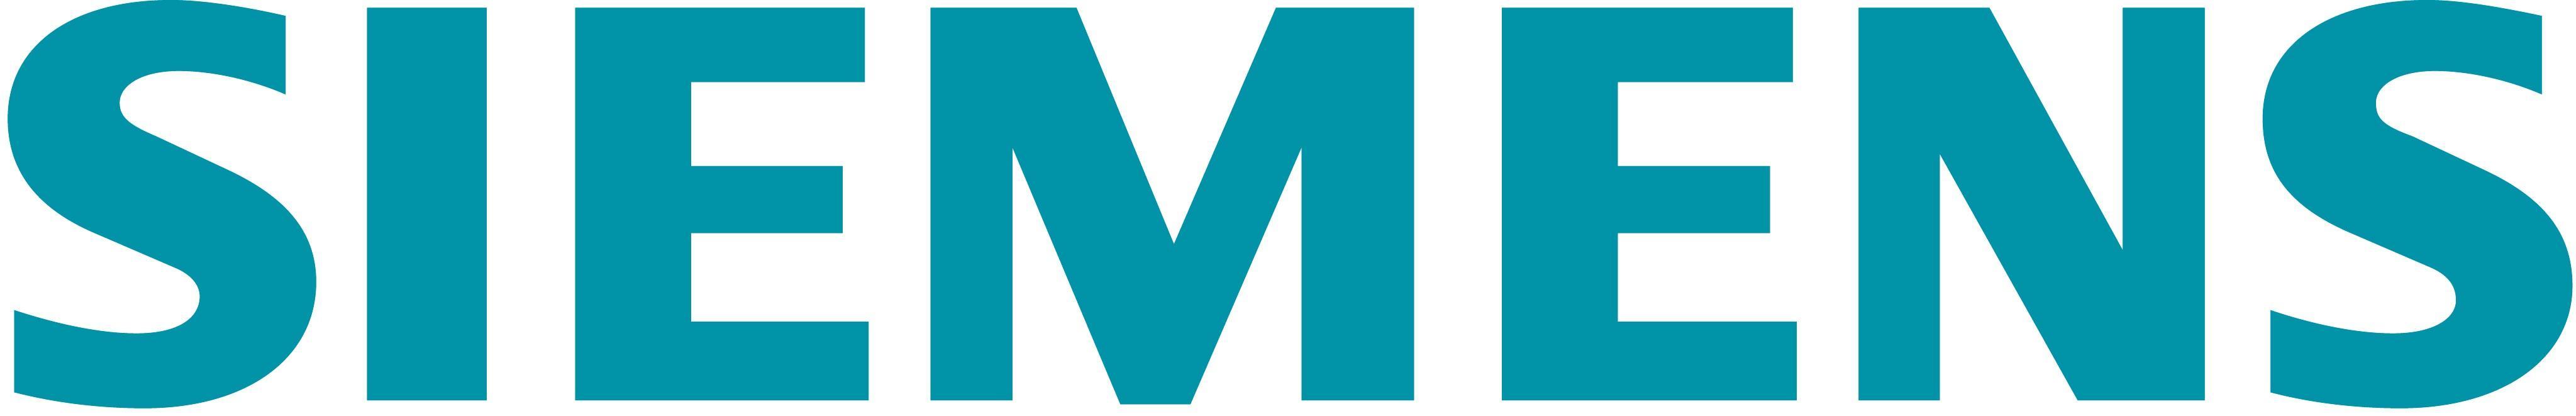 Siemens_logo-7.jpg